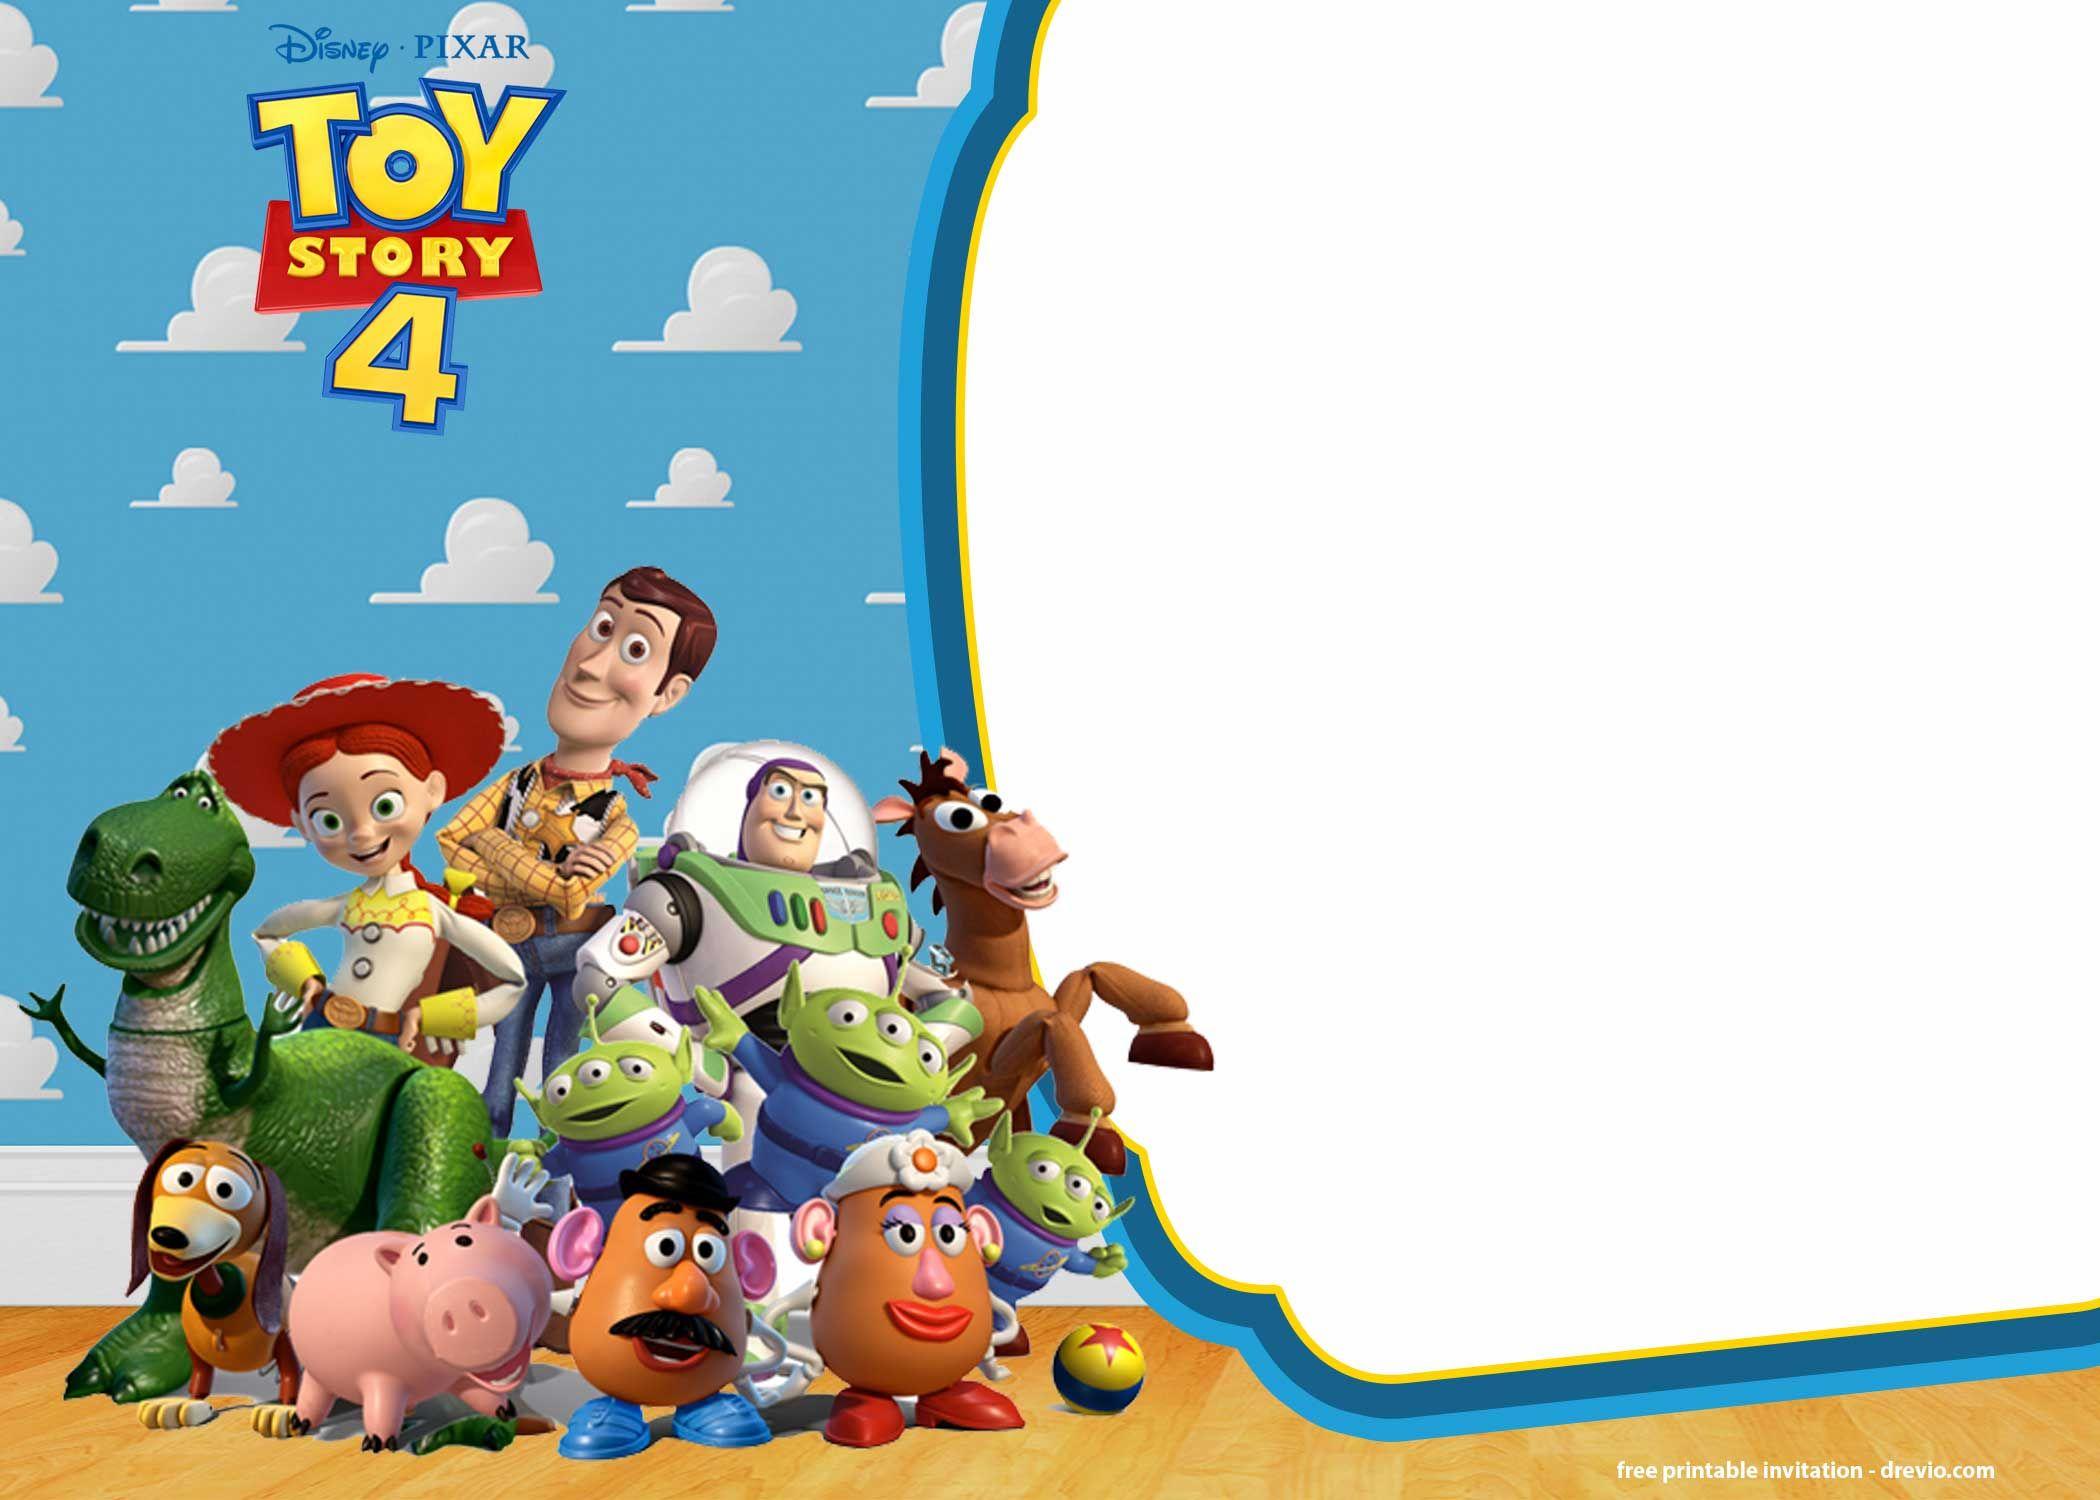 Free Printable Toy Story 4 Invitation Templates Toy Story Invitations Toy Story Birthday Party Toy Story Birthday Toy story invitation template download